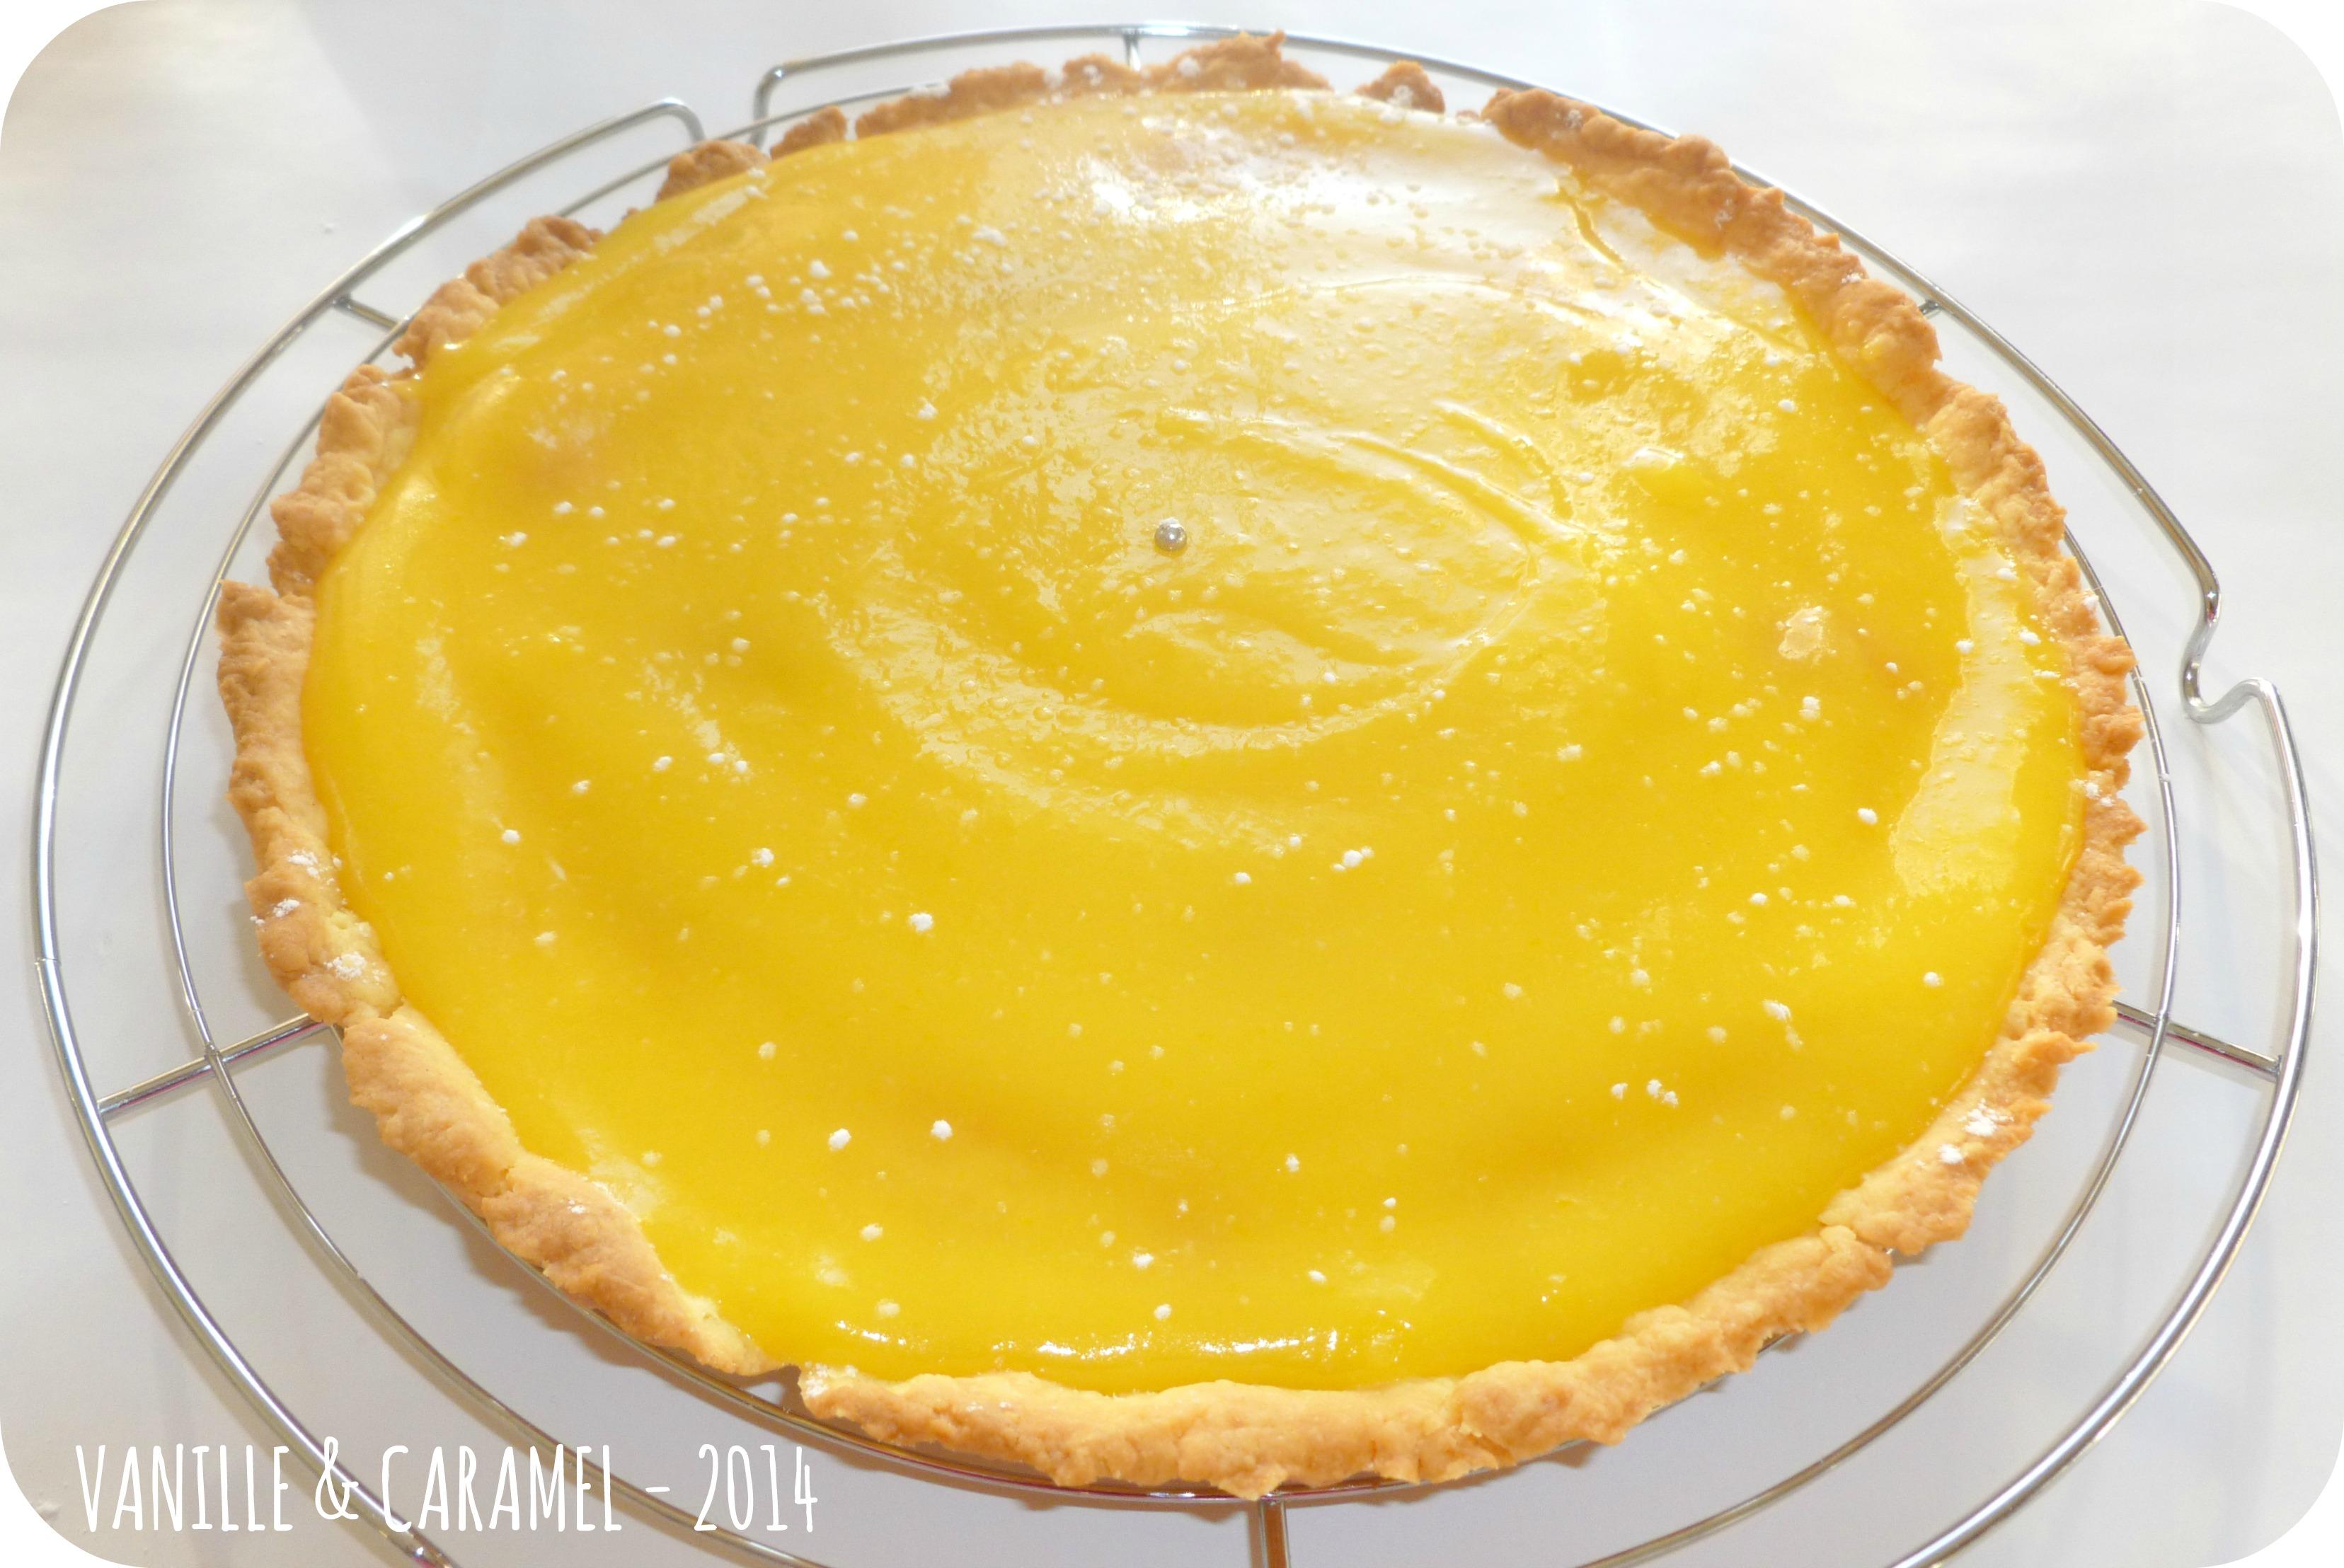 tarte au citron vanille caramel